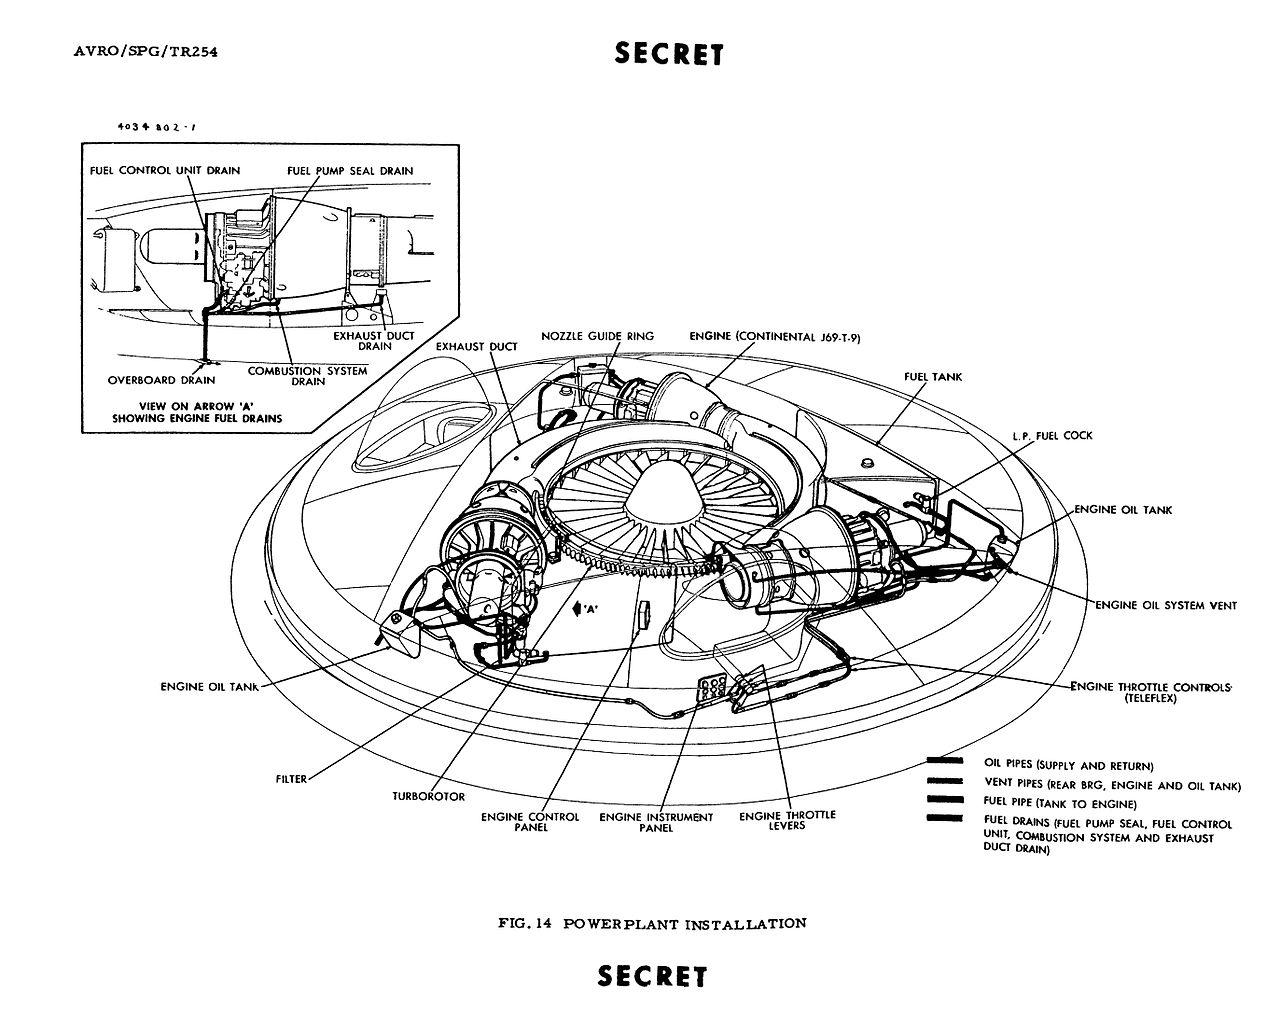 Fileavrocar Schematic High Resolution Wikipedia Oil Tank